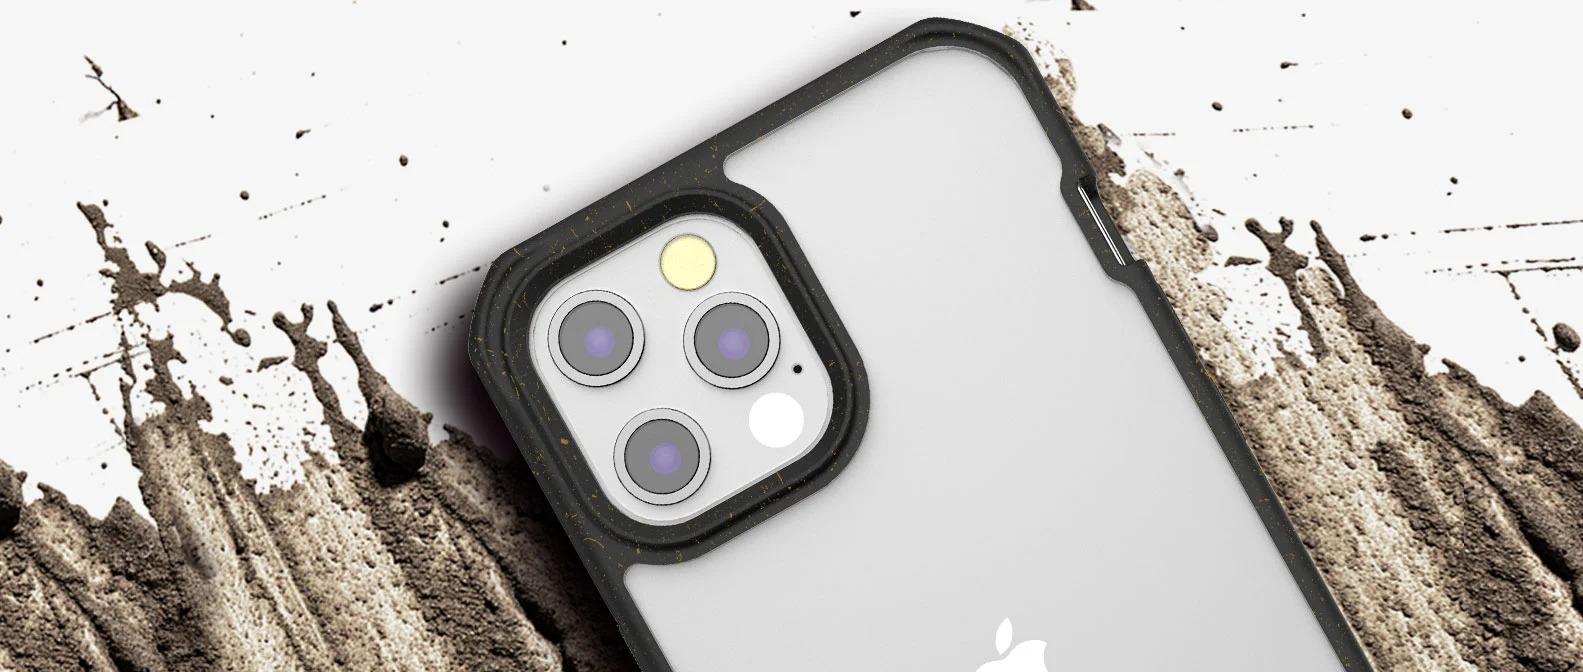 Ốp lưng ITSKINS (Pháp) Feroniabio Pure Drop Safe cho iphone 12